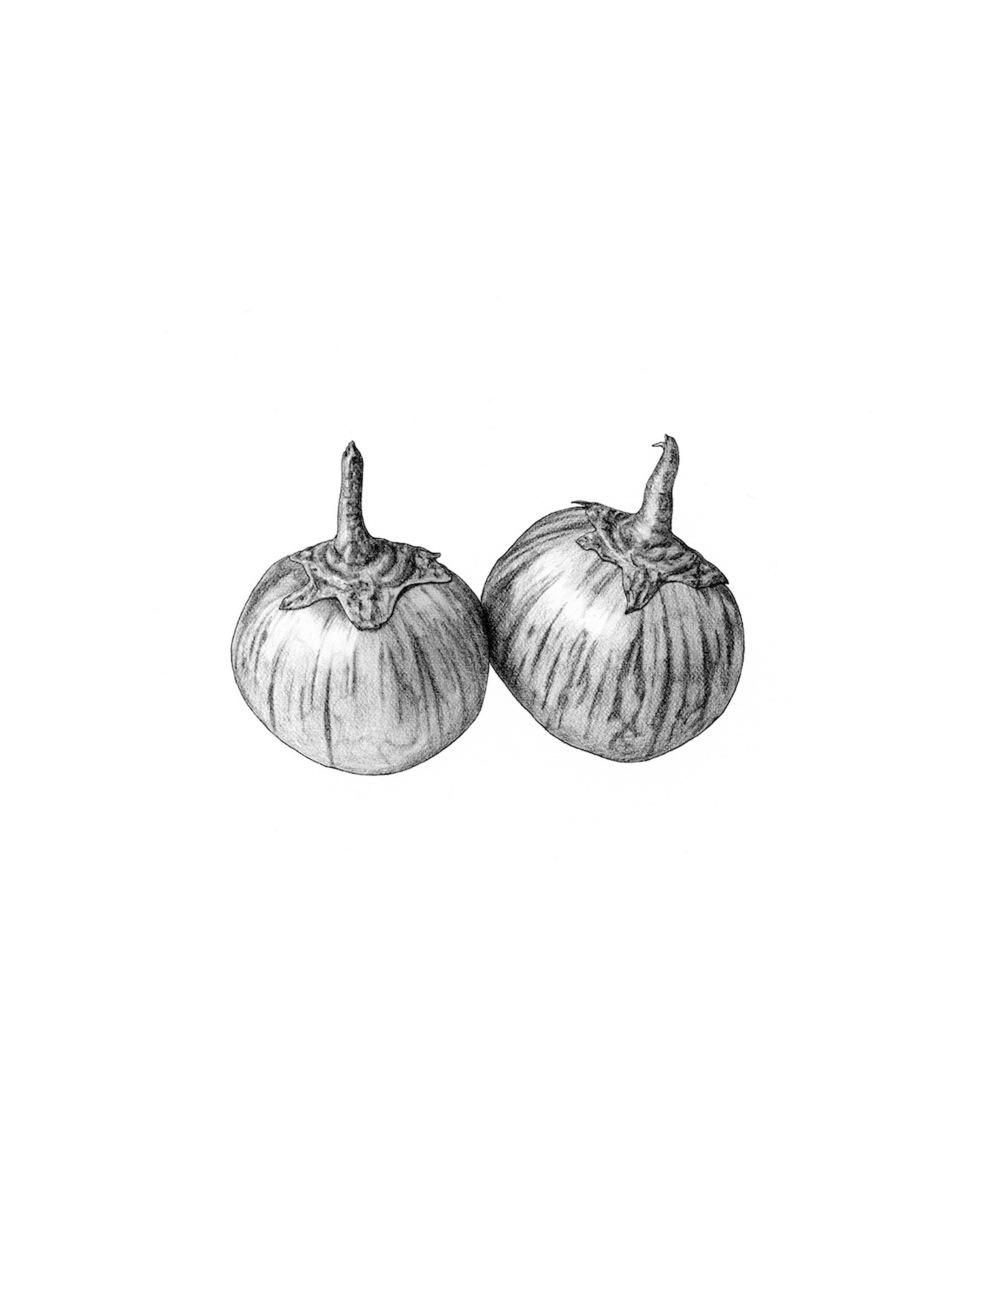 ss.eggplant, thai.jpg